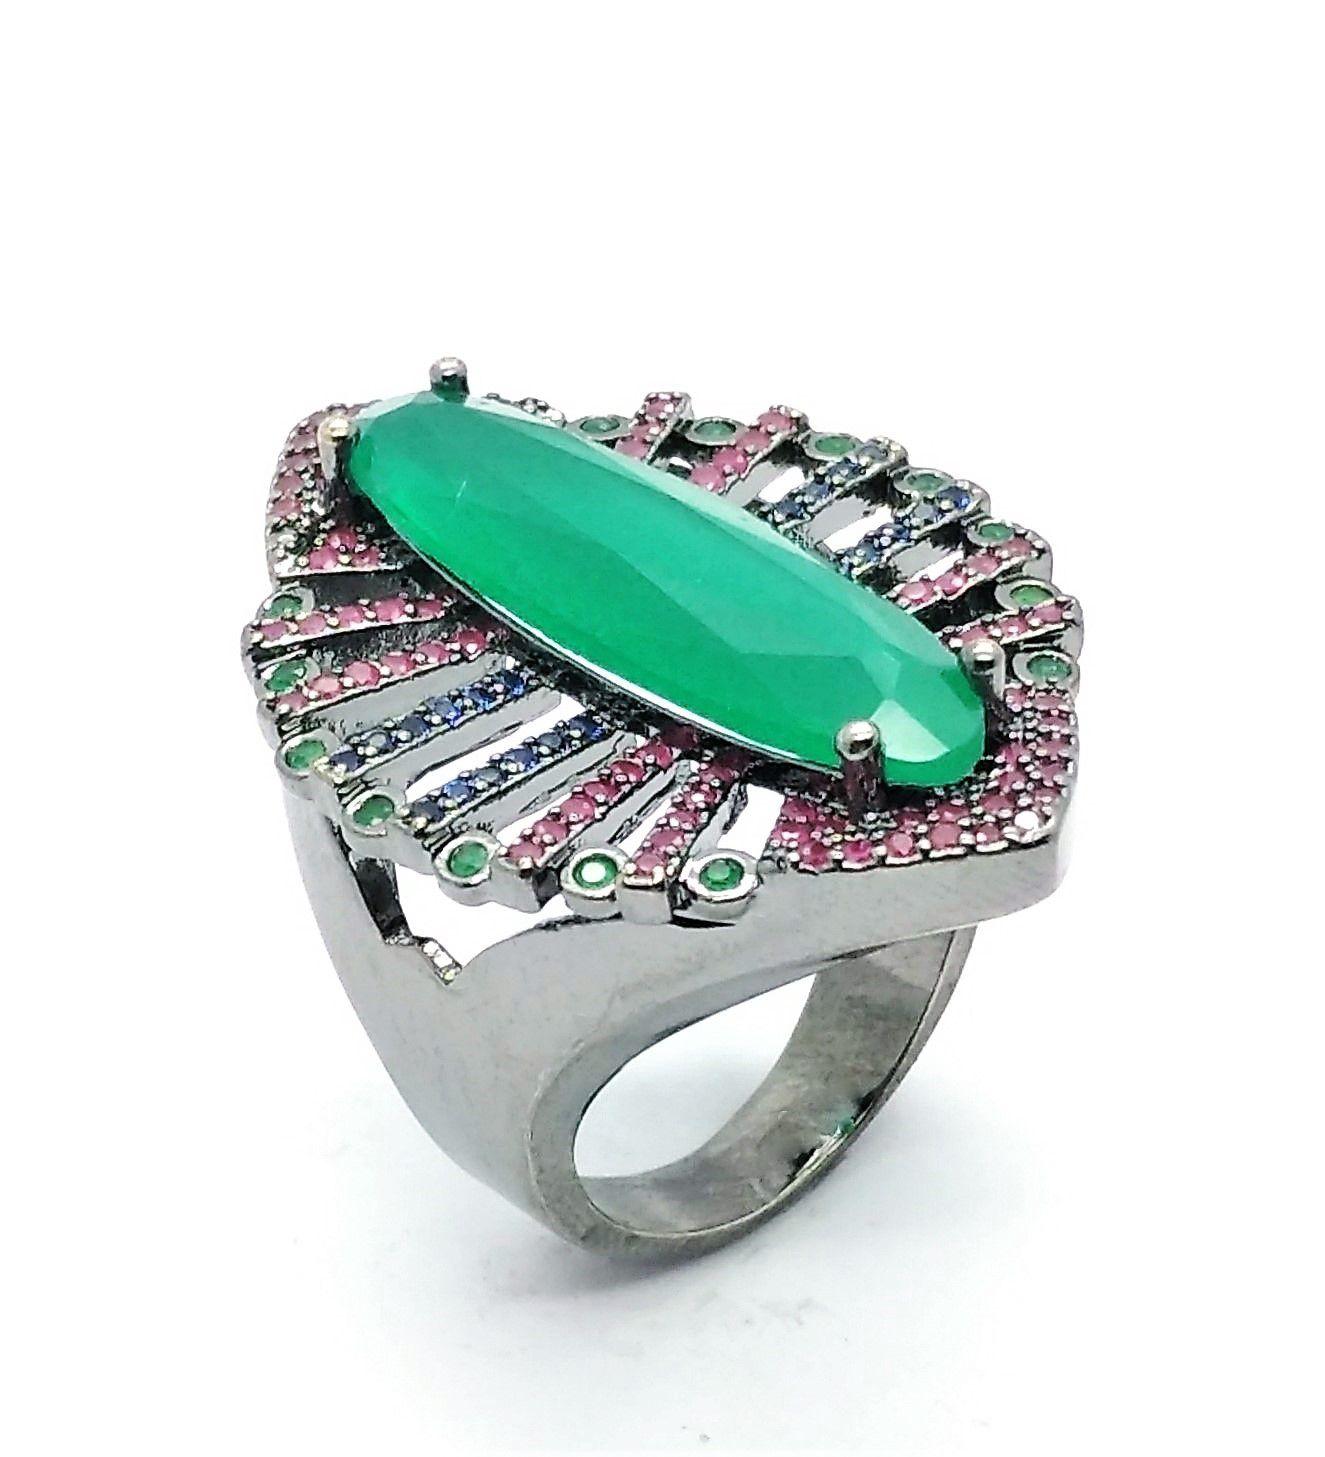 Anel E Brincos Verde Esmeralda Cravejados De Zirconias Em Ródio Negro 4006 4007